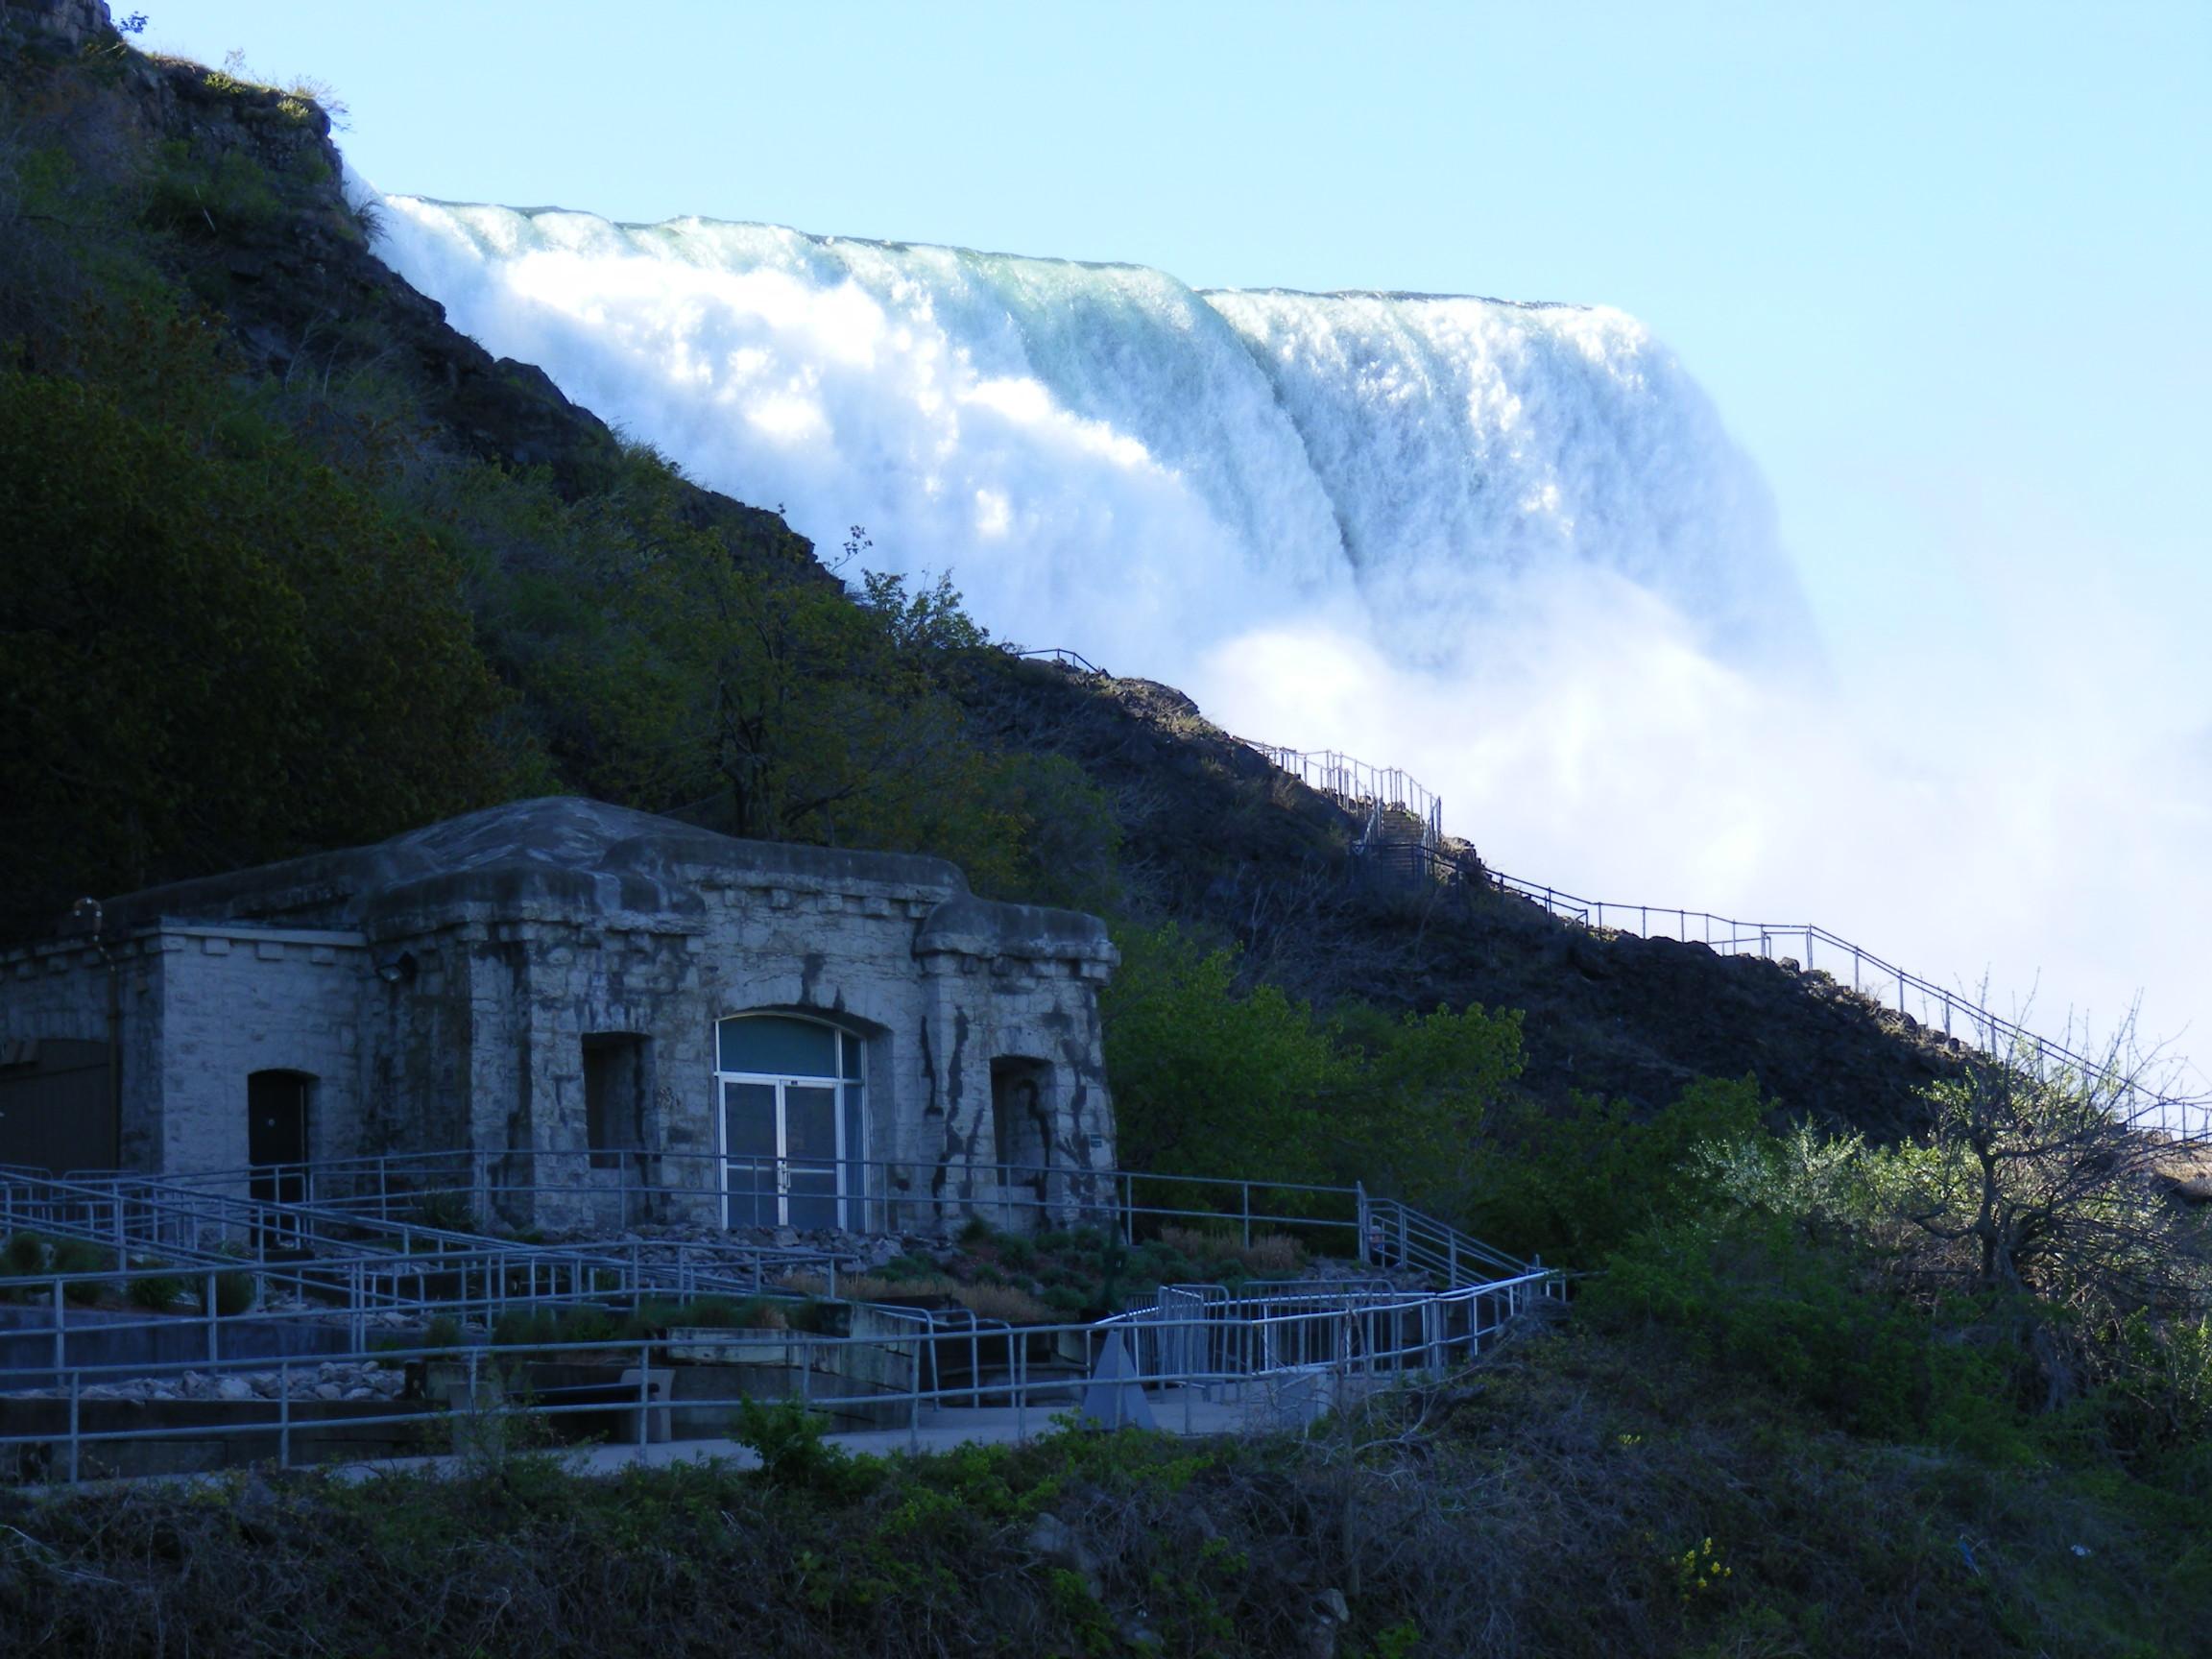 Beauty of Niagara Falls, River, Relax, Rock, Rocks, HQ Photo